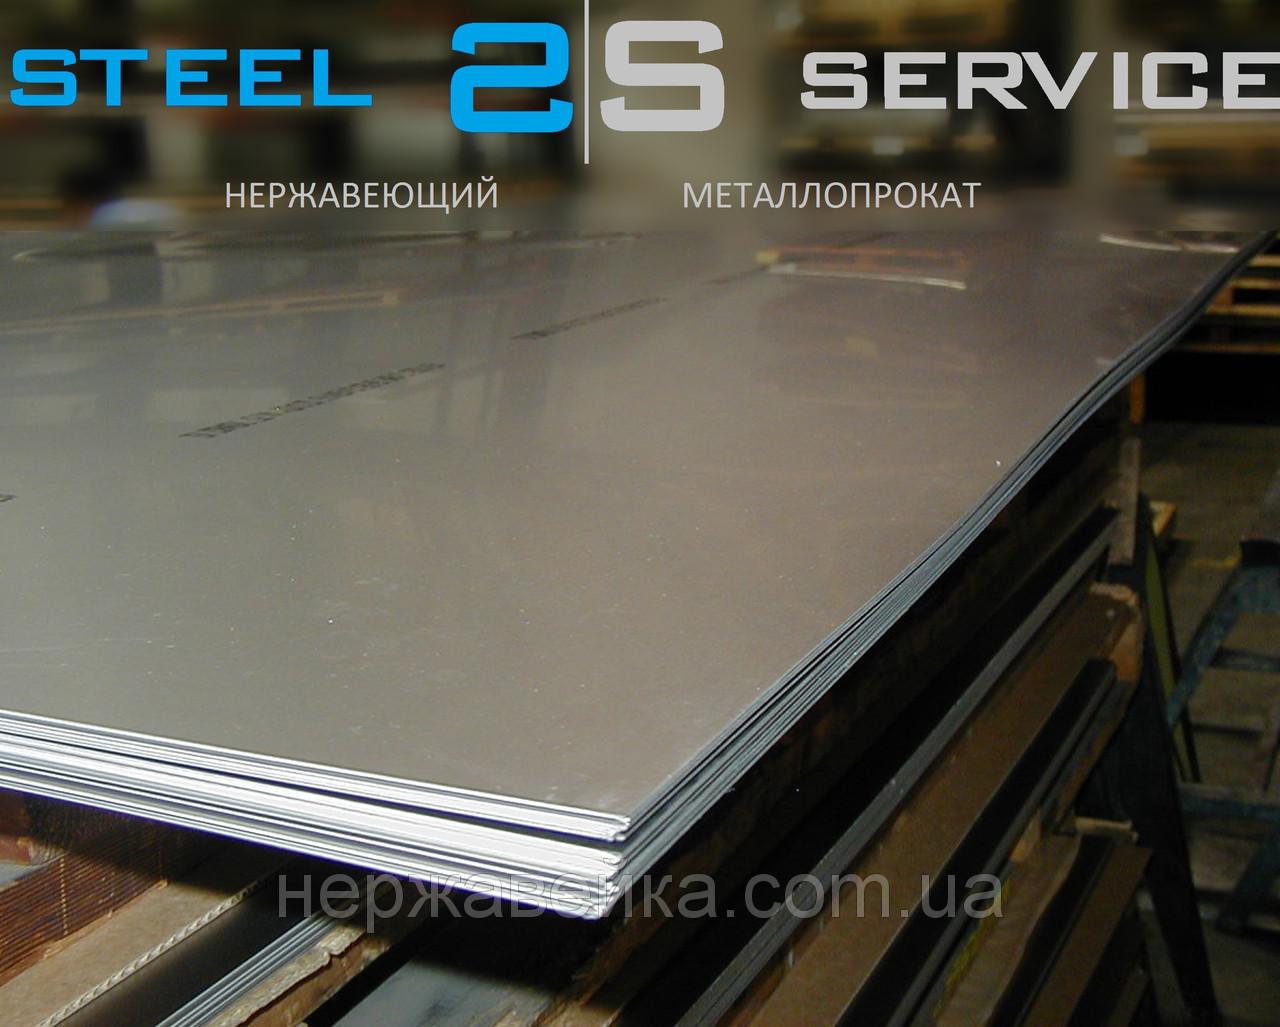 Листовая нержавейка 0,4х1250х2500мм AISI 430(12Х17) BA - зеркало, технический